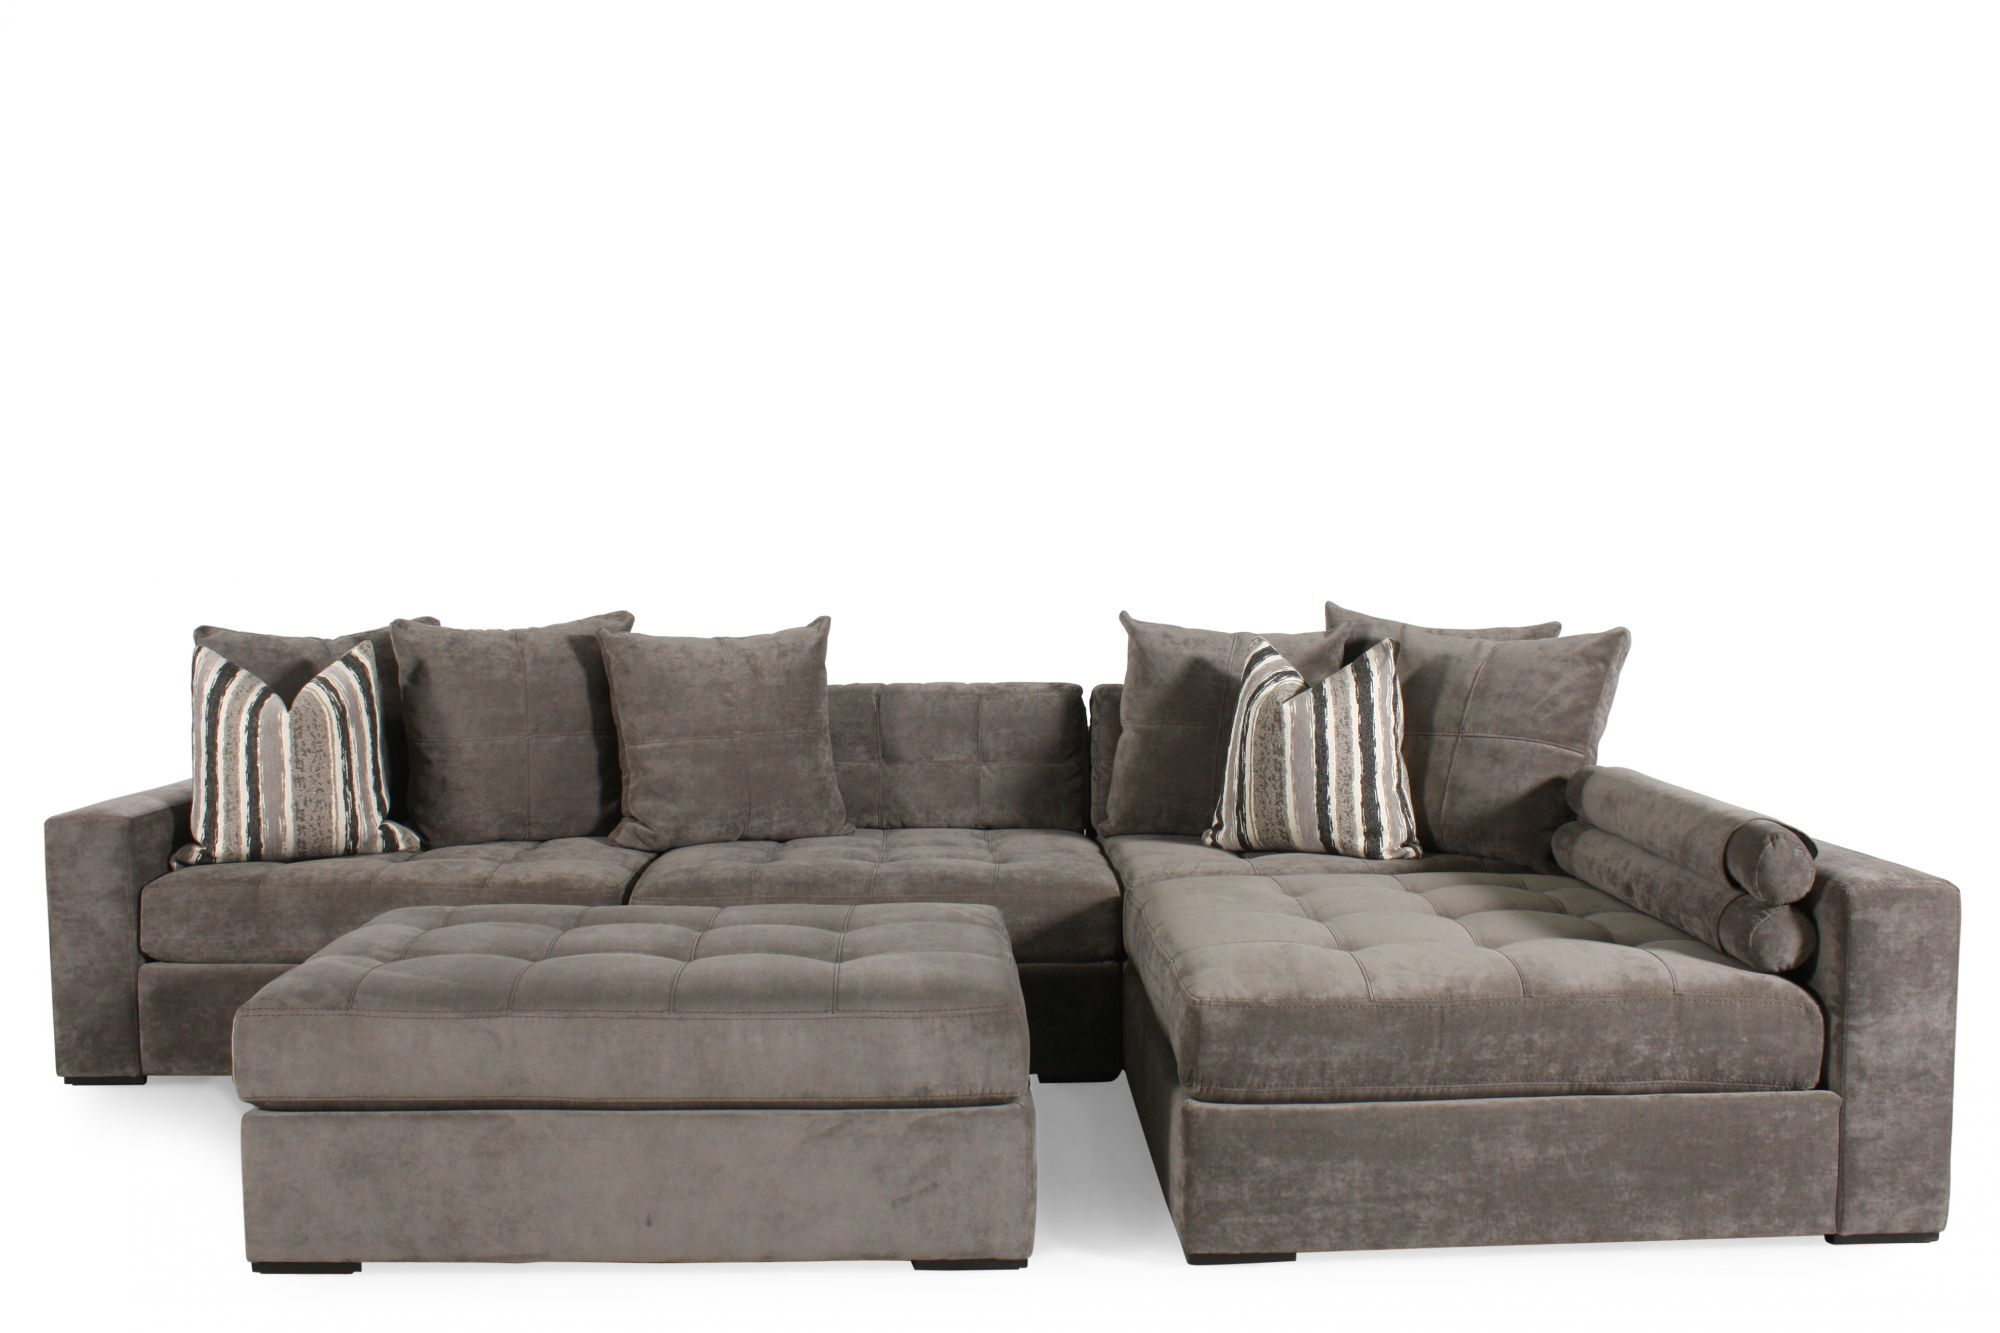 jonathan louis sofas marshmallow 2 in 1 flip open sofa disney doc mcstuffins noah gray sectional mathis brothers furniture